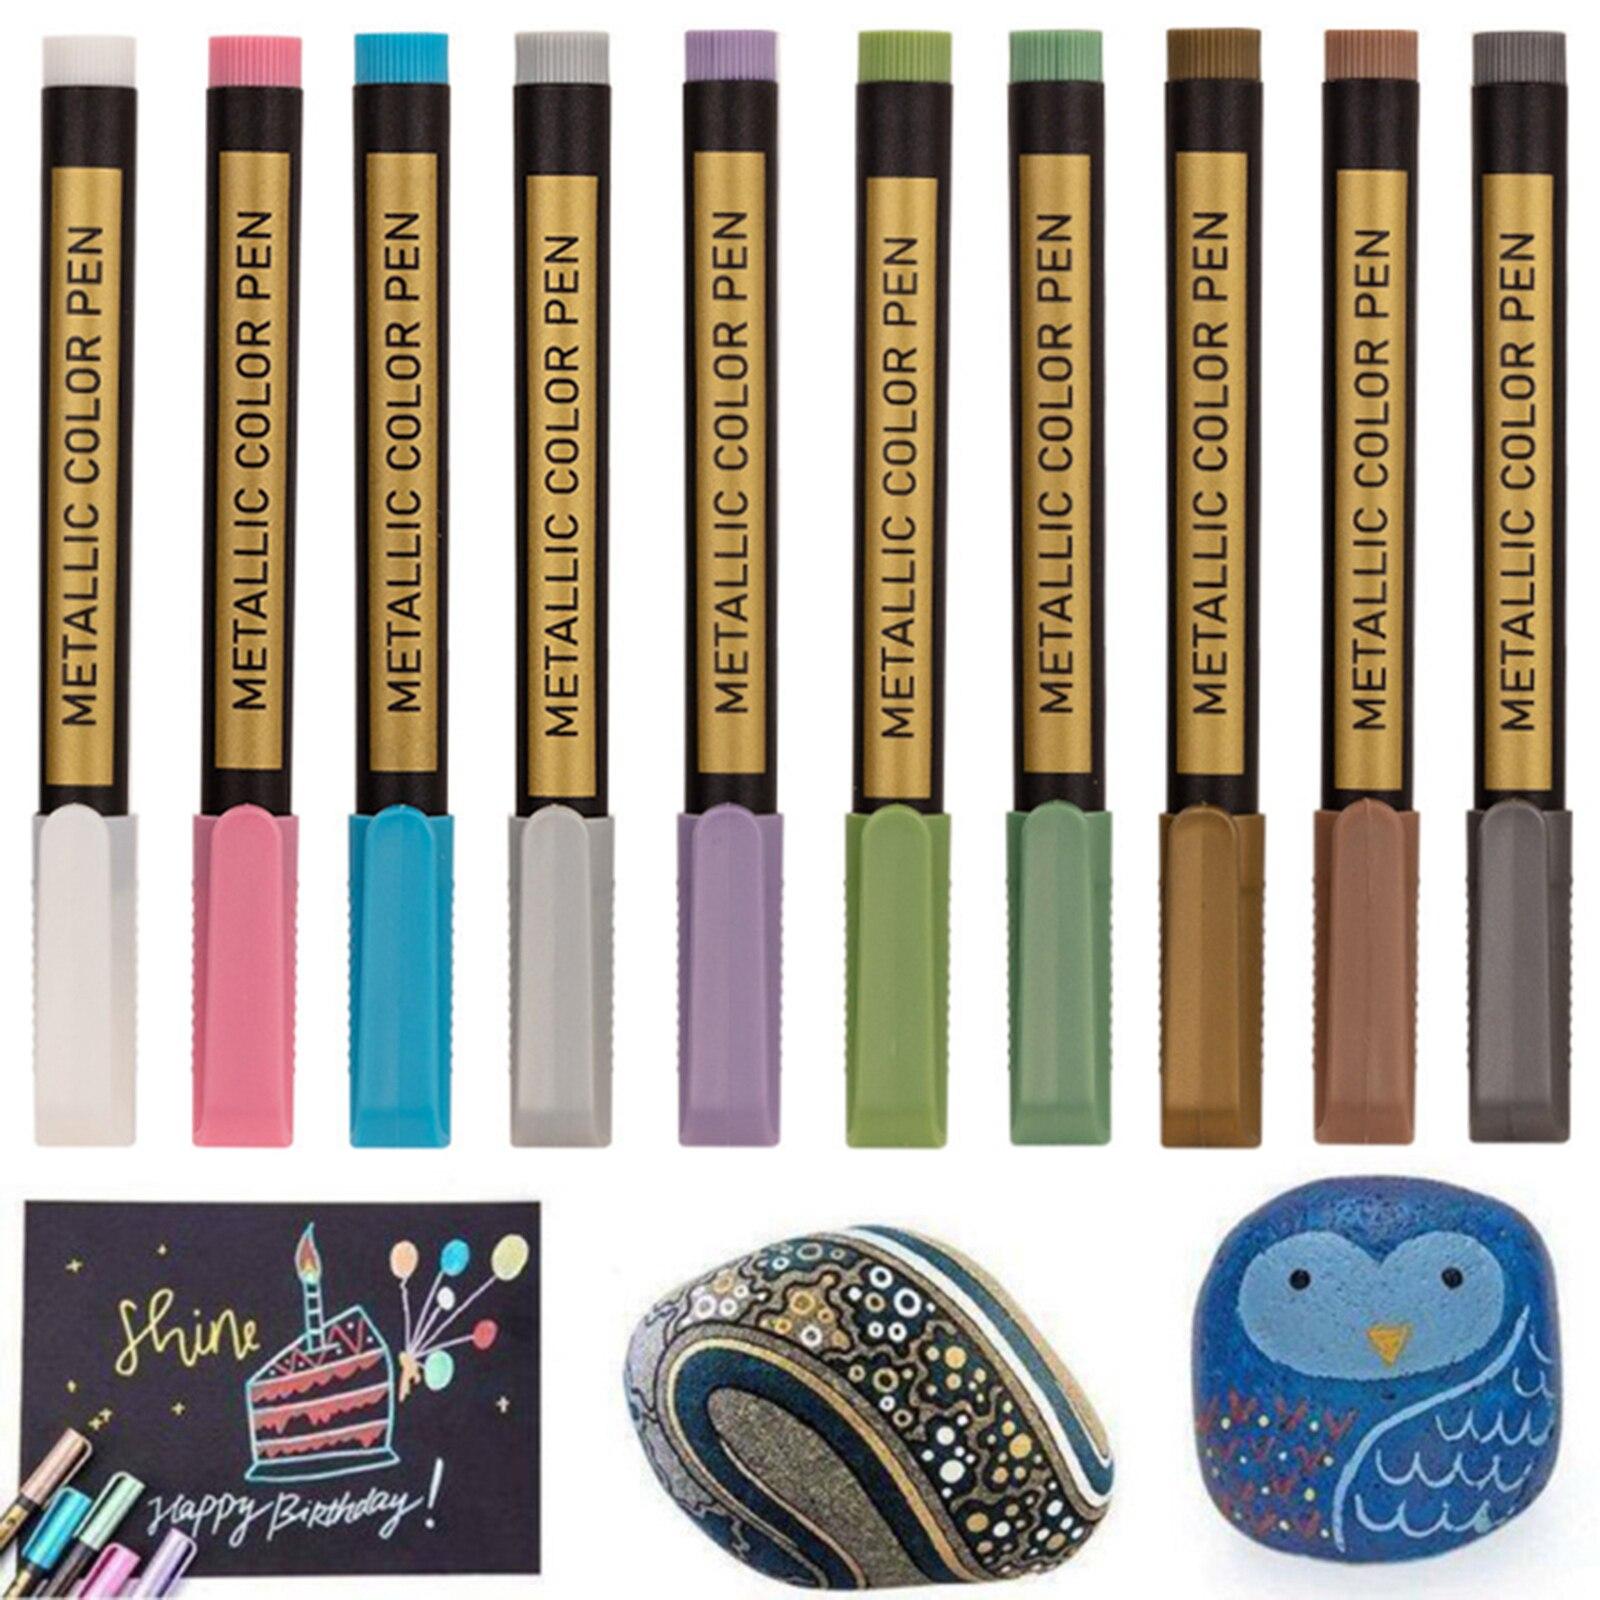 10x Metallic Marker Pens for Paper Card Making DIY Photo Album Marker Pen for Painting